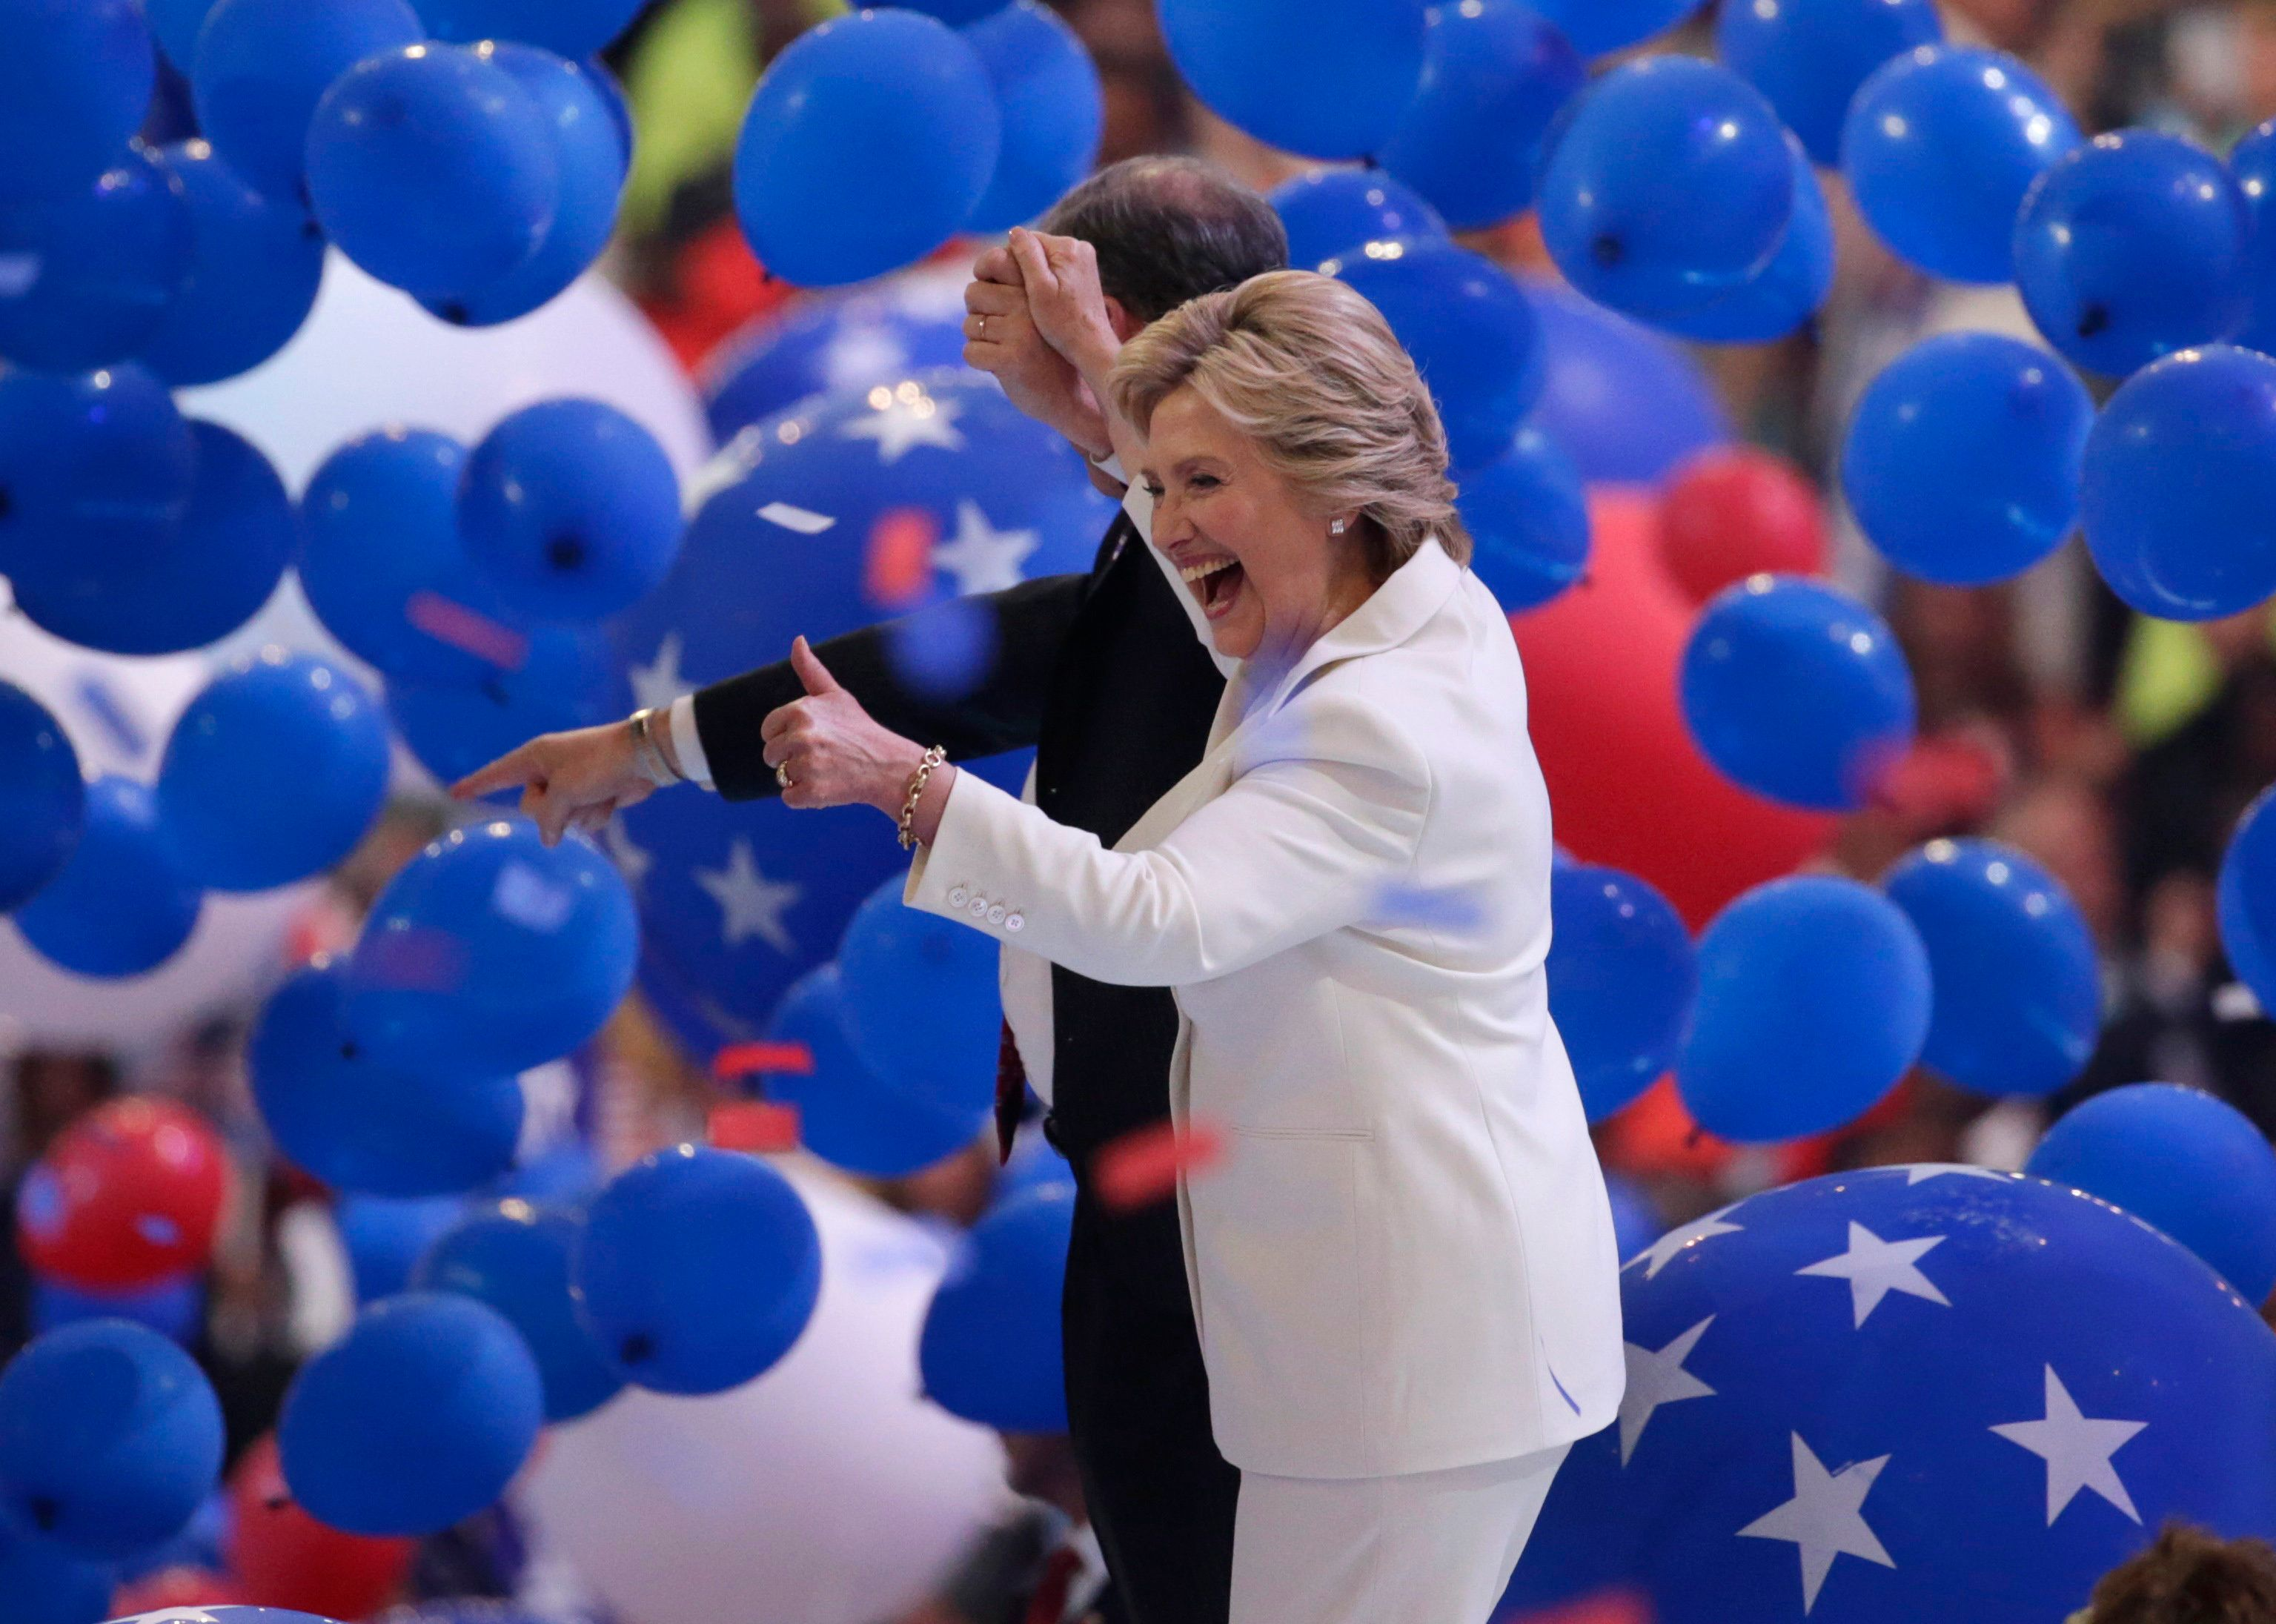 Friday's Morning Email: Top Democrats Say 2016 Nomination Rigged ...